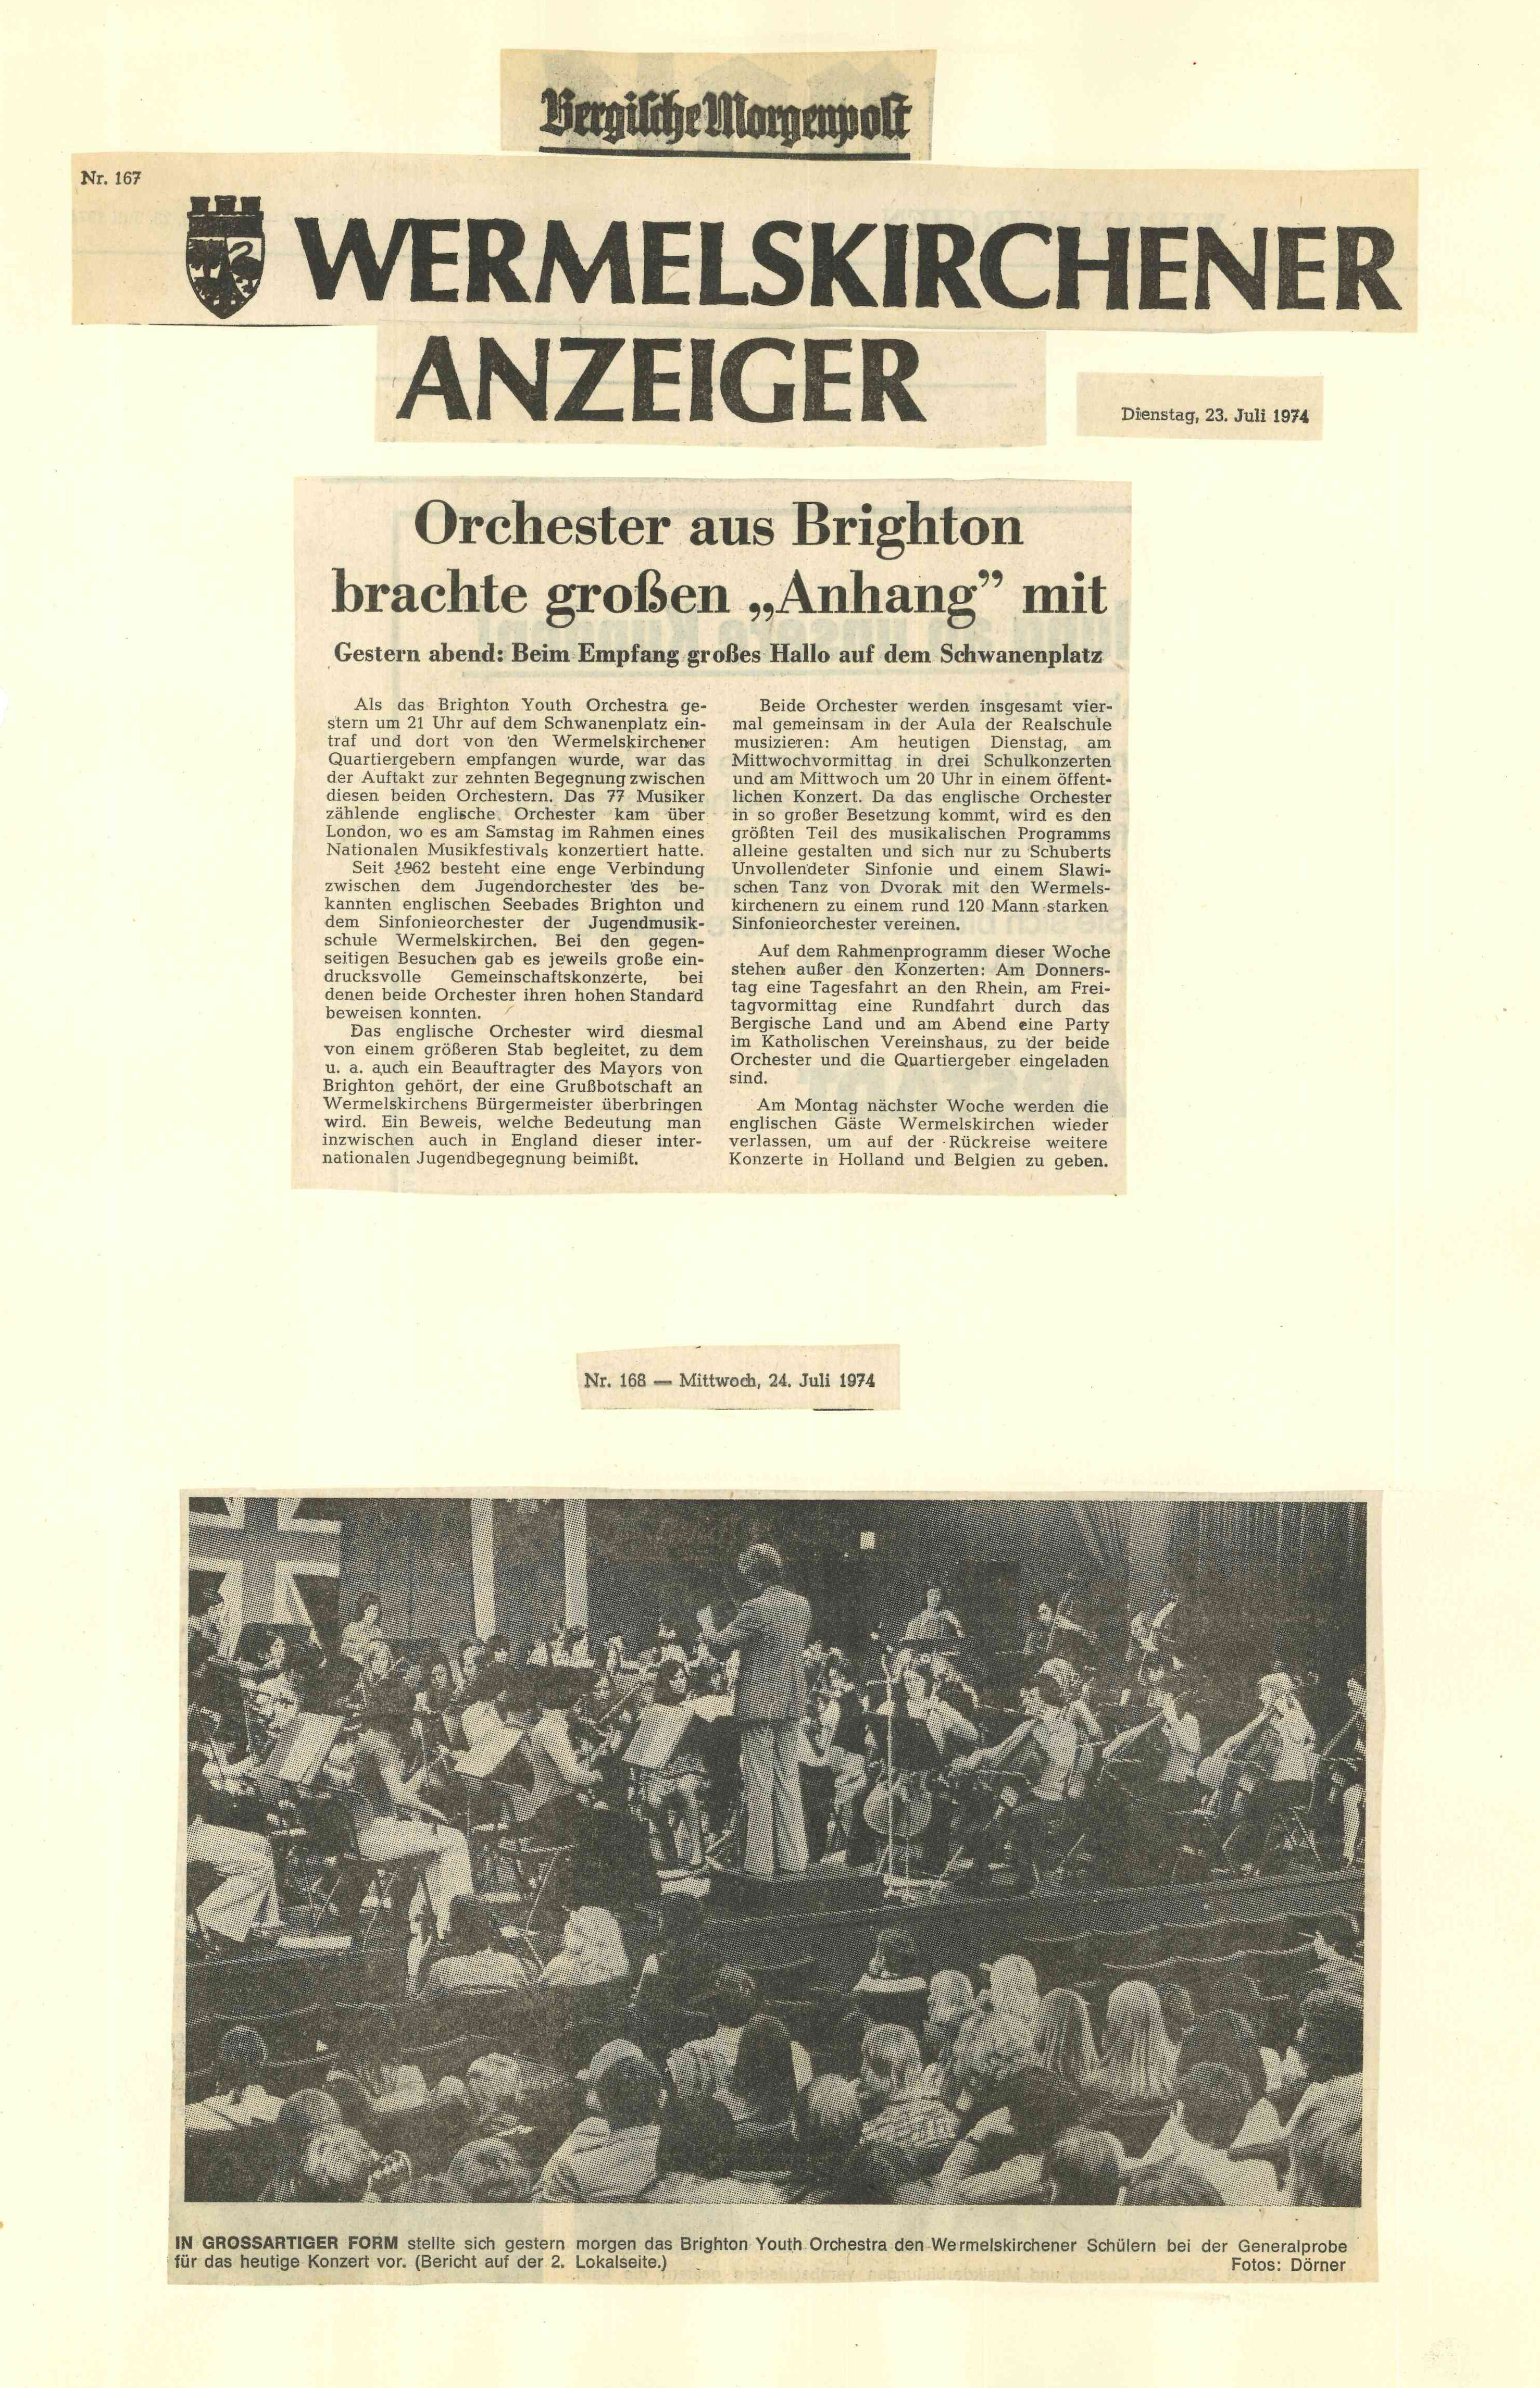 00088-Wermelskirchener Anzeiger 23rd July 1974.jpg